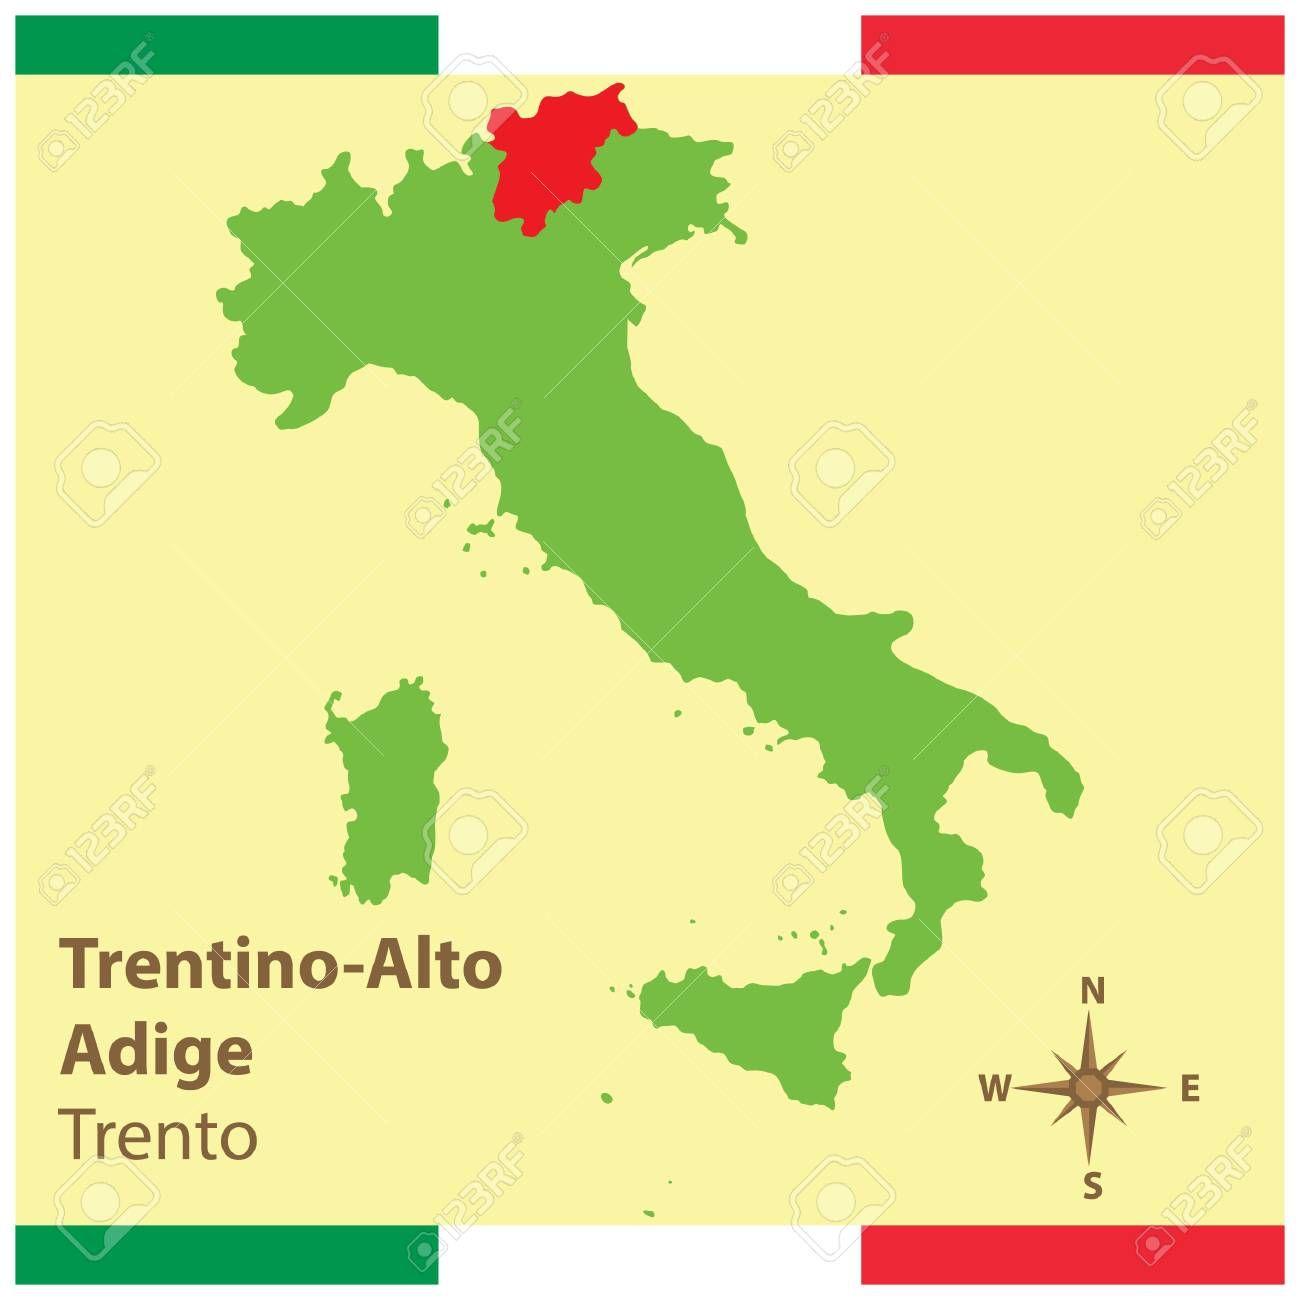 Trentino Alto Adige On Italy Map Ad Alto Trentino Adige